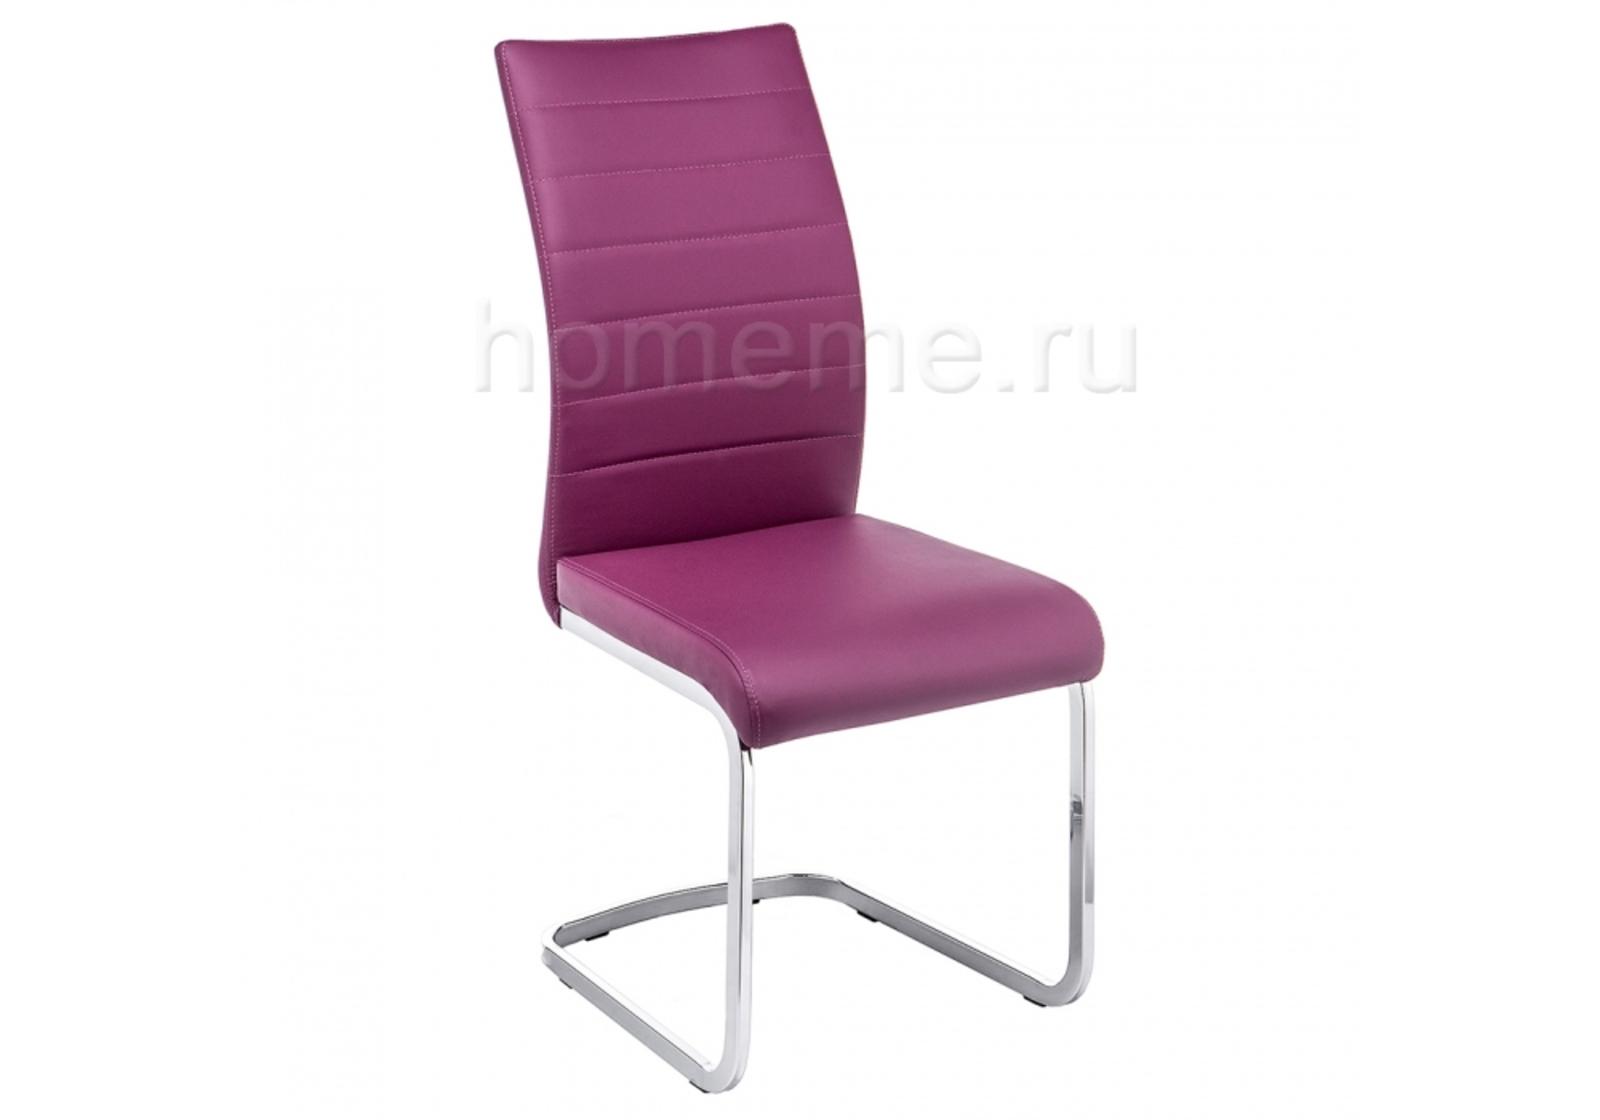 Стул HomeMe Basit фиолетовый 11146 от Homeme.ru